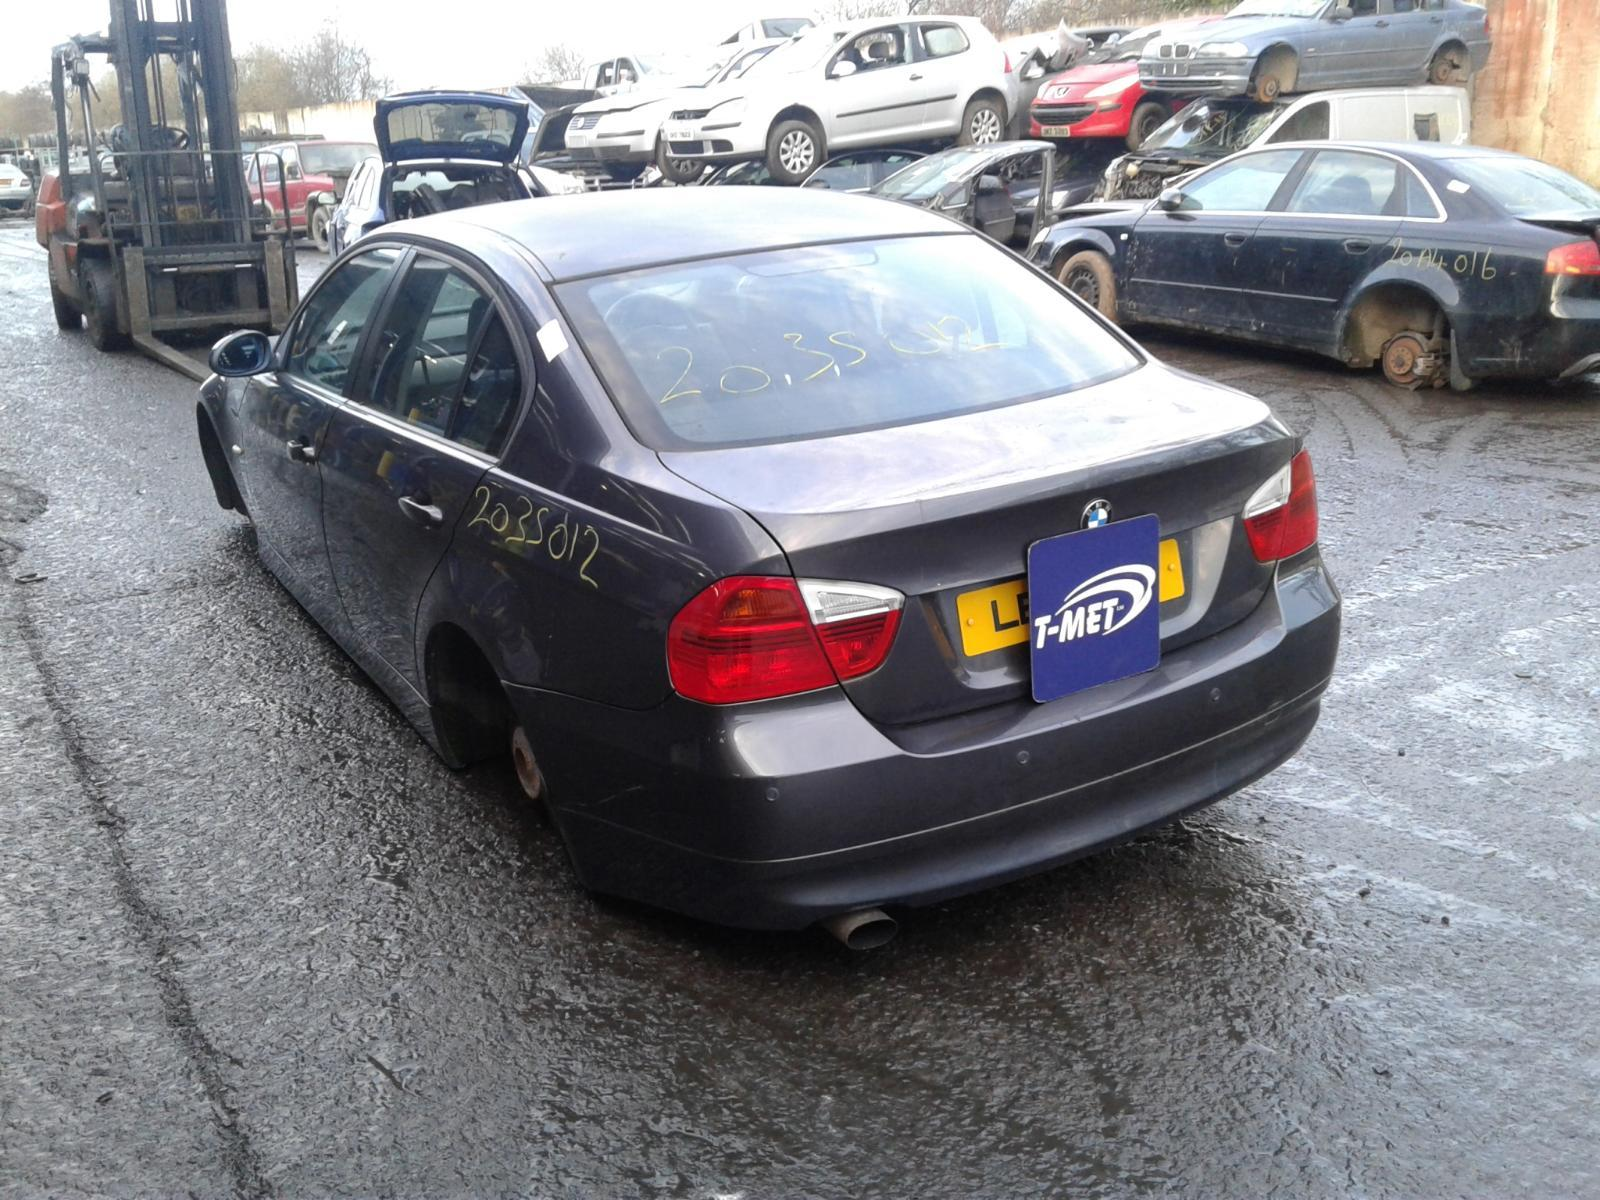 2007 BMW 3 SERIES Image